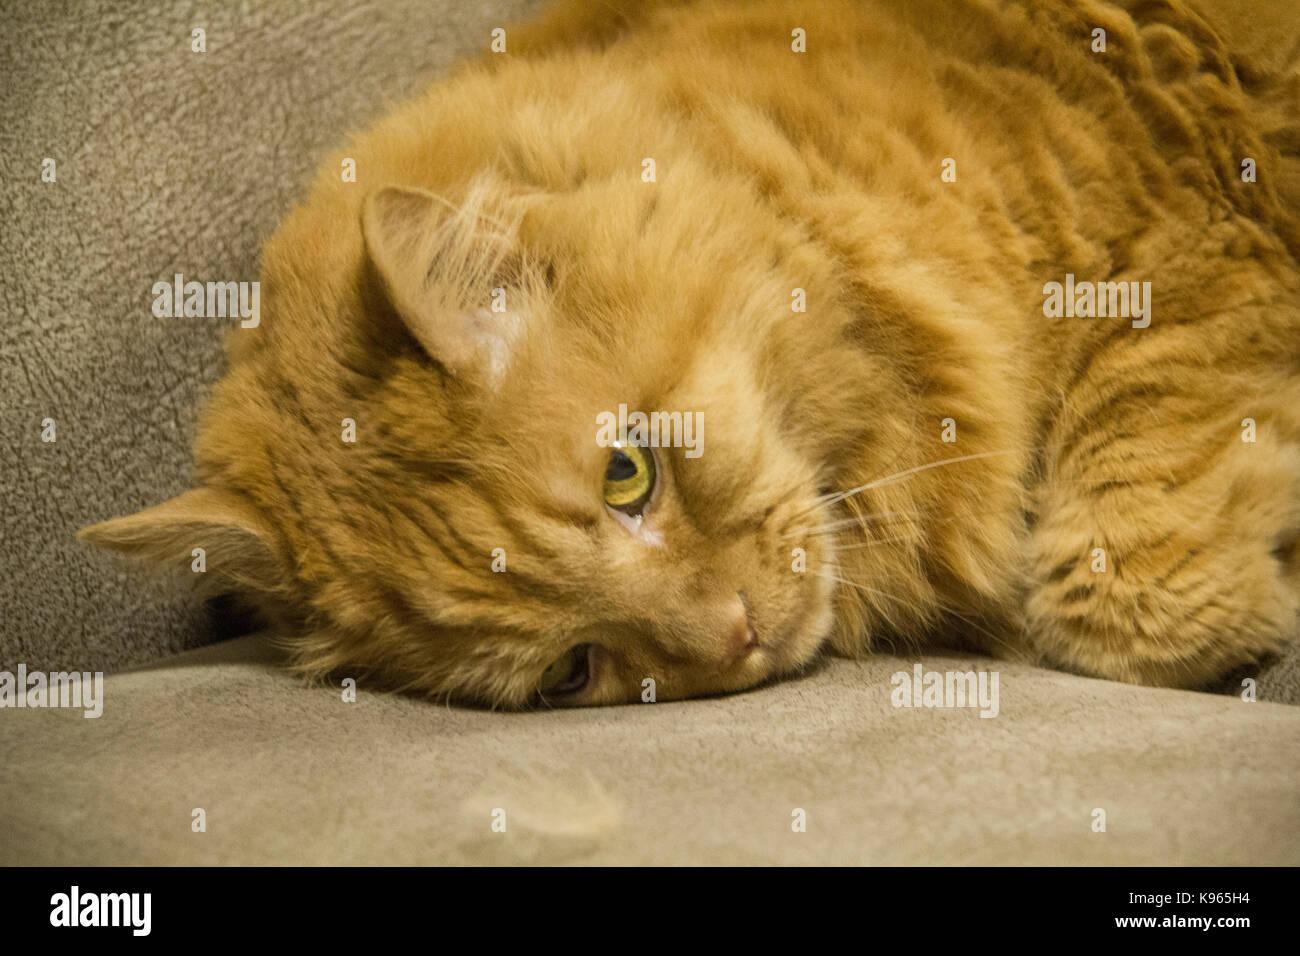 Adult persian cat with sad yellow eyes lying on the sofa .Closeup - Stock Image